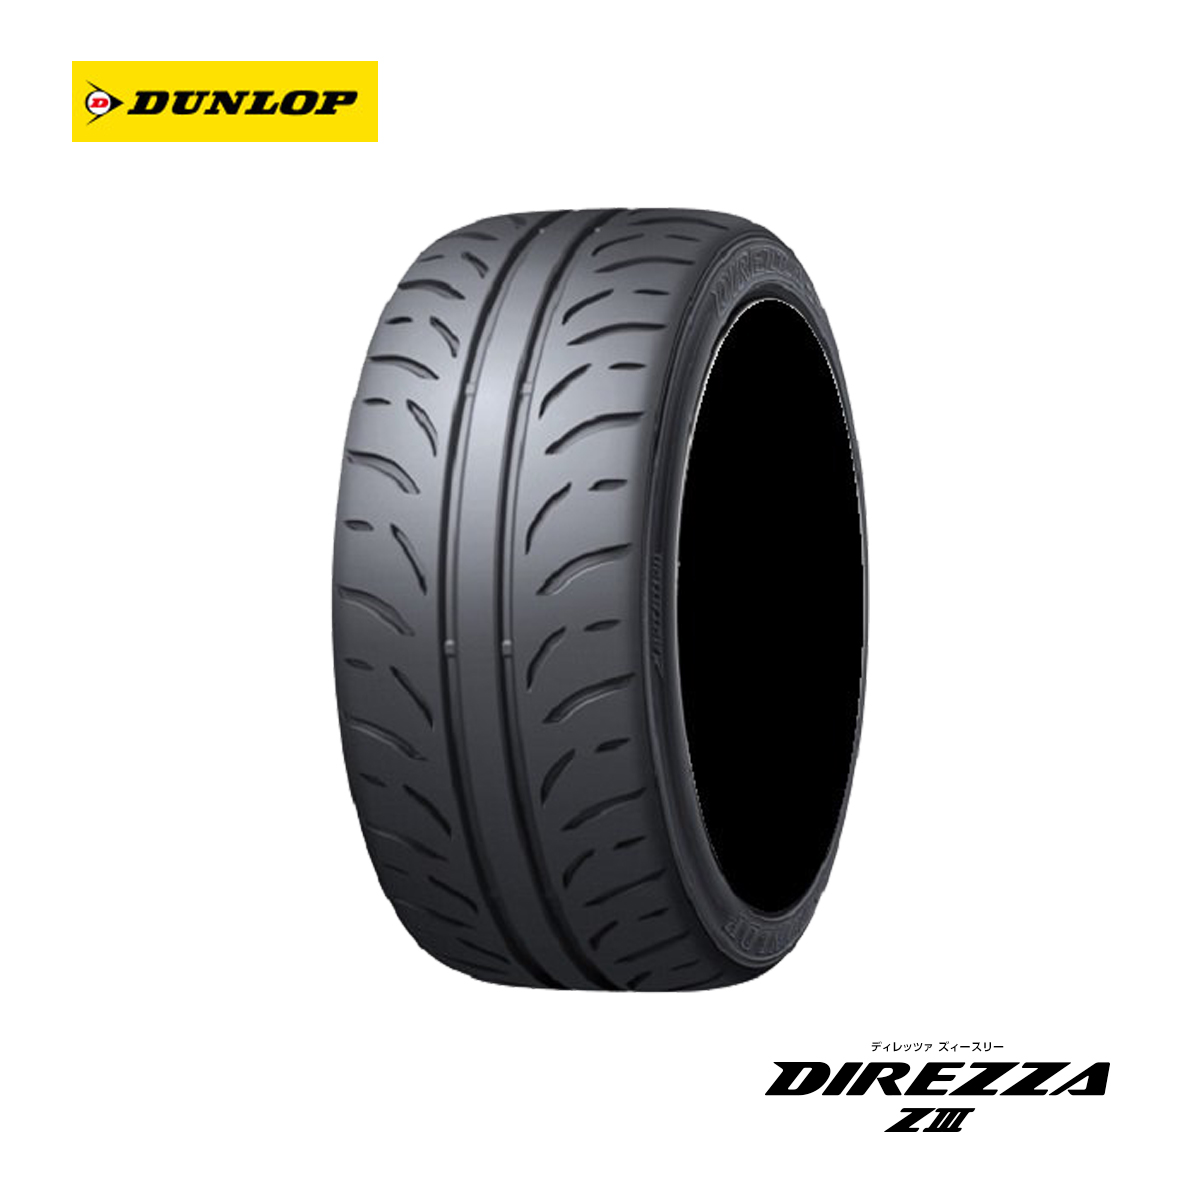 DUNLOP ダンロップ サマータイヤ 1本 18インチ 255/35R18 DIREZZA Z3 ディレッツァ